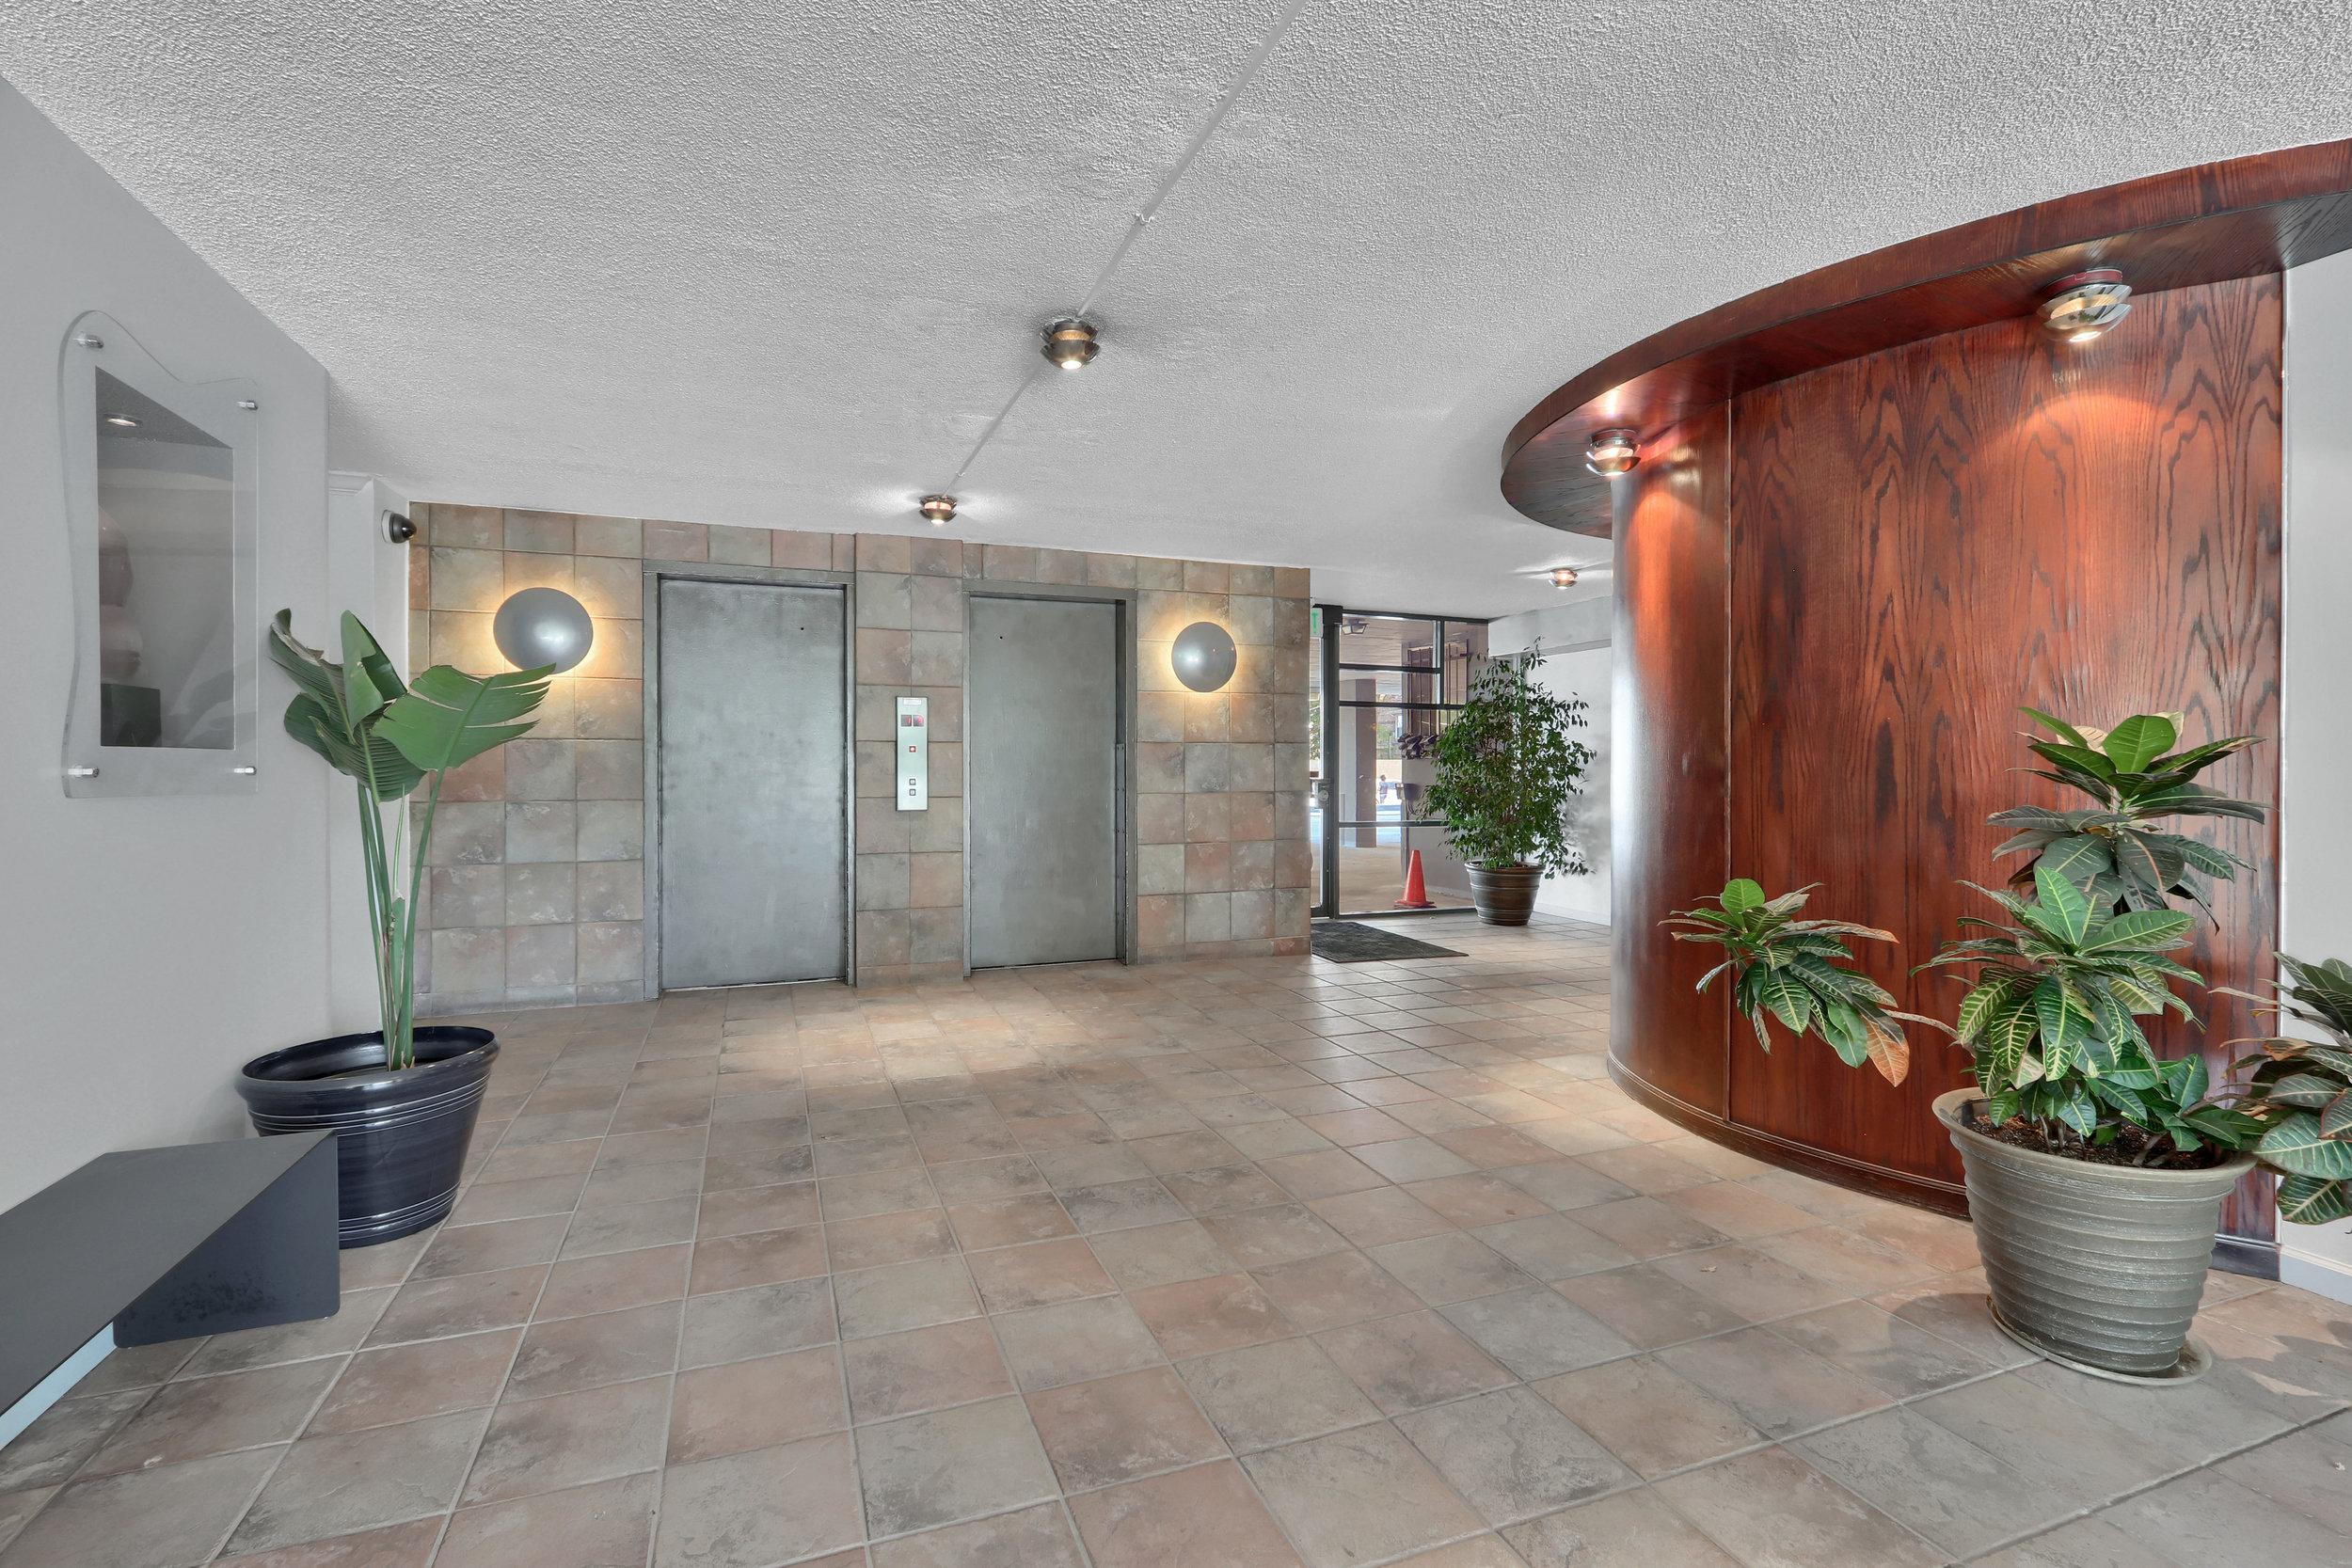 909 N Logan St Unit 3J Denver-print-019-018-Building Foyer-4200x2800-300dpi.jpg